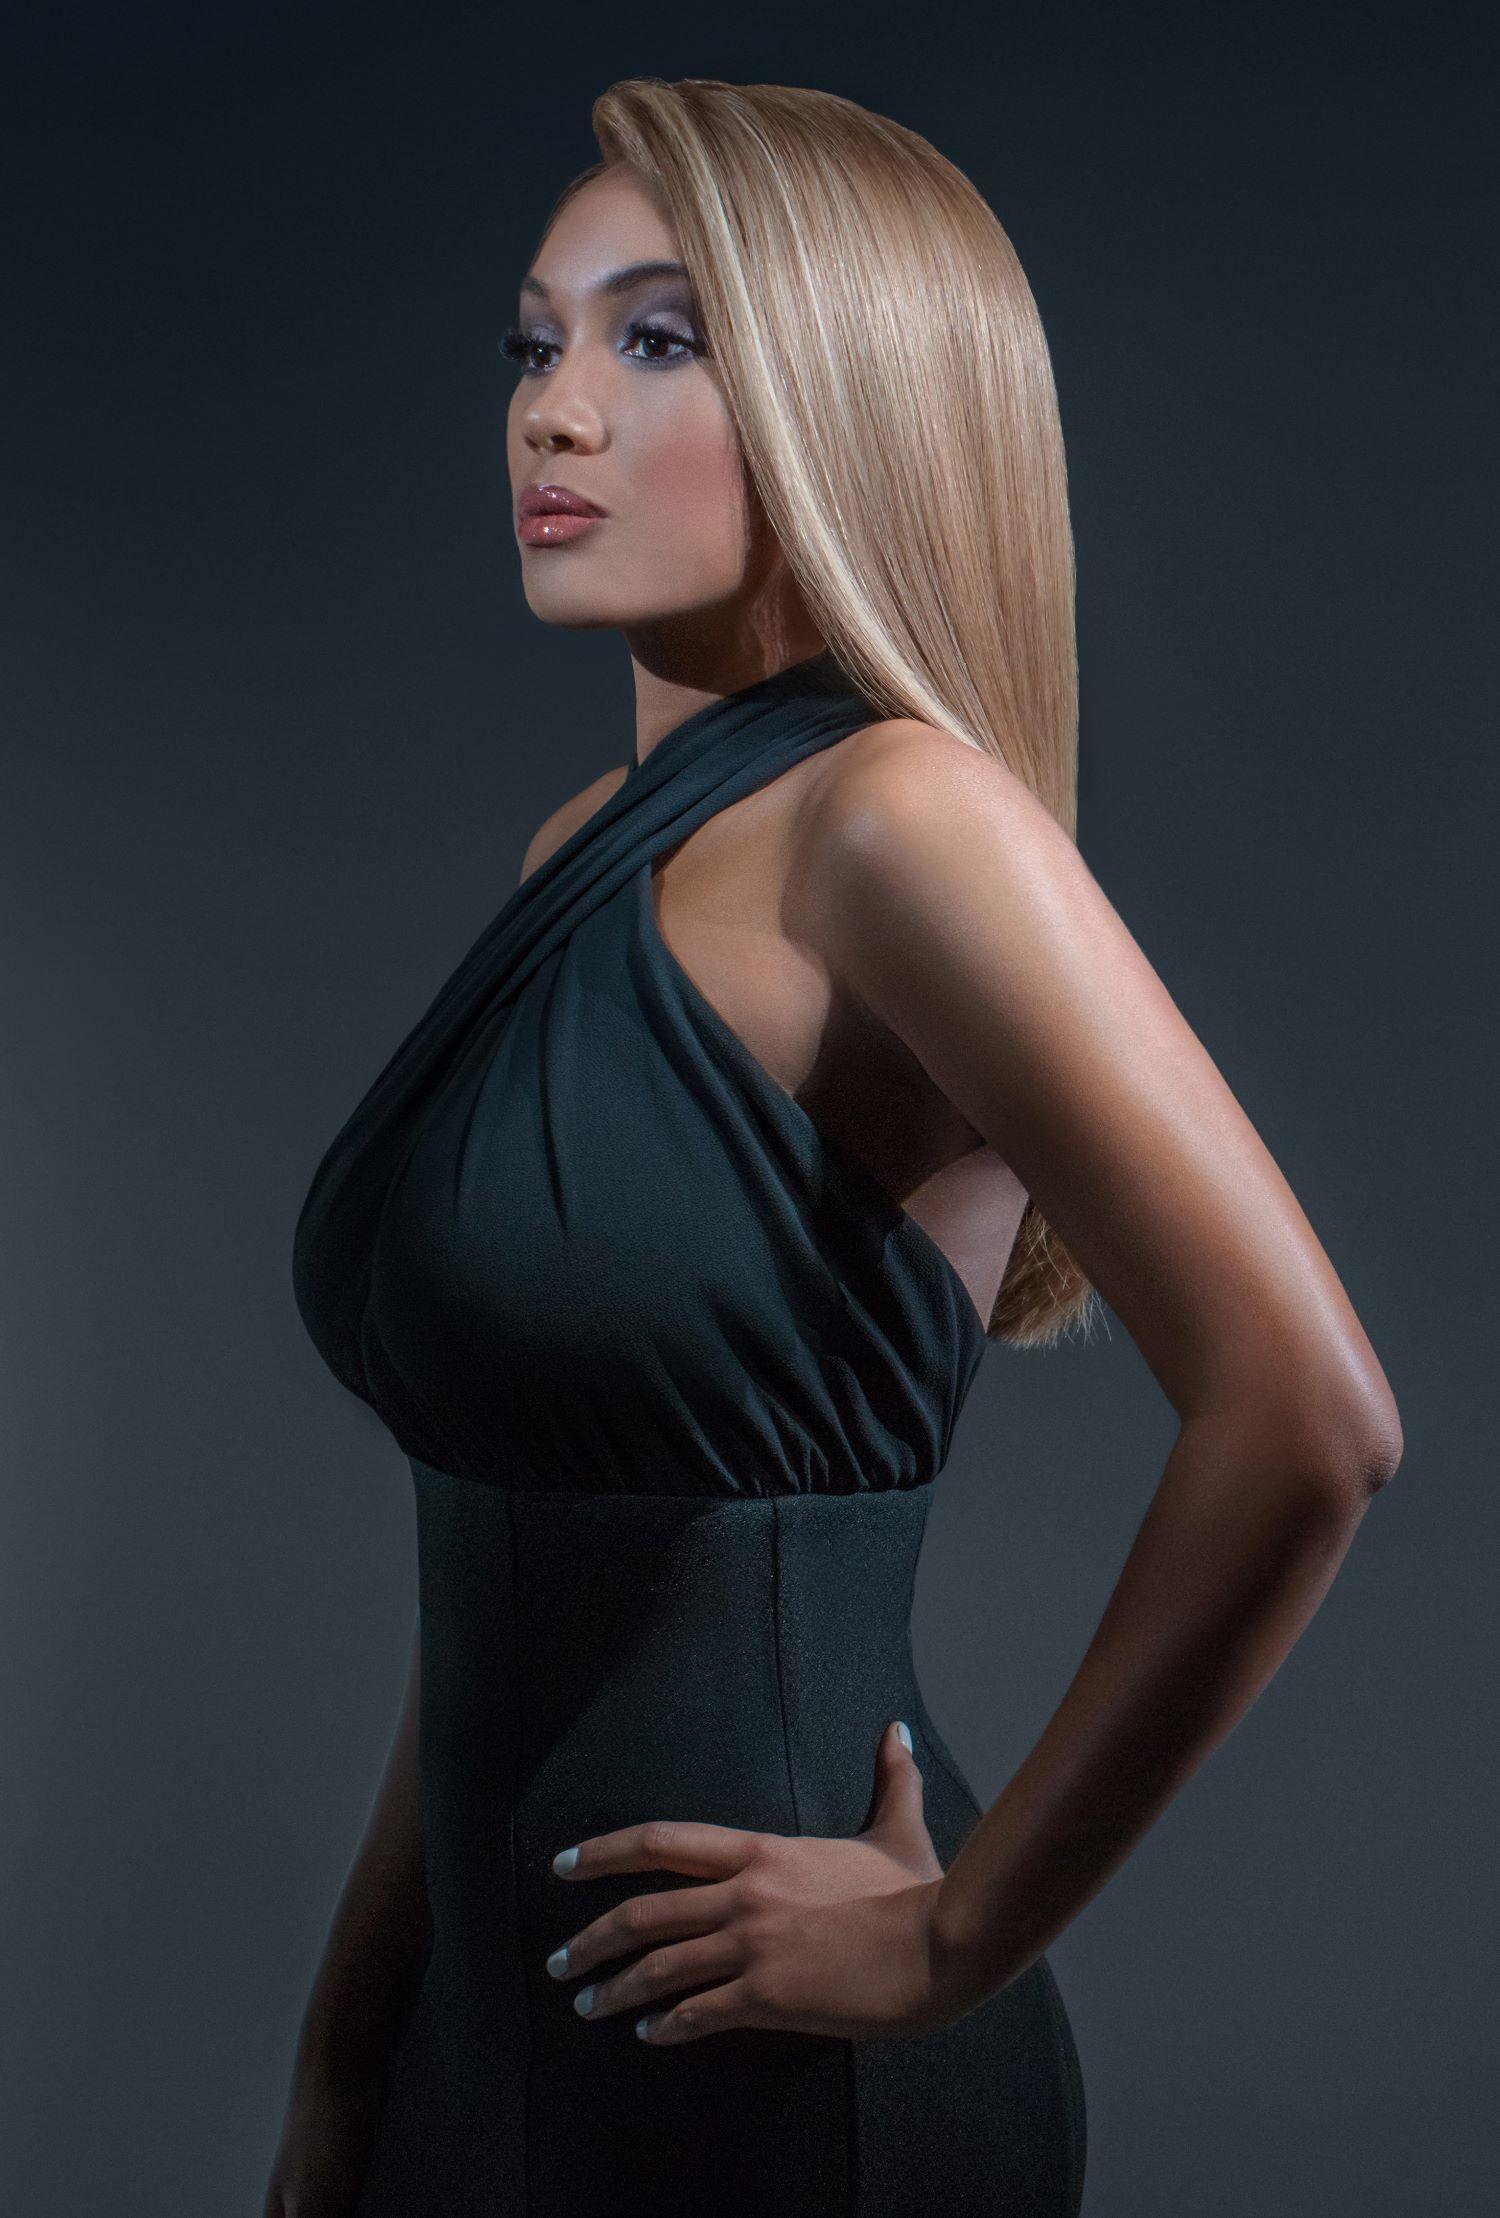 Opaline Luxury Full Lace Ash Blonde Wig- 360 Frontal Lace 6